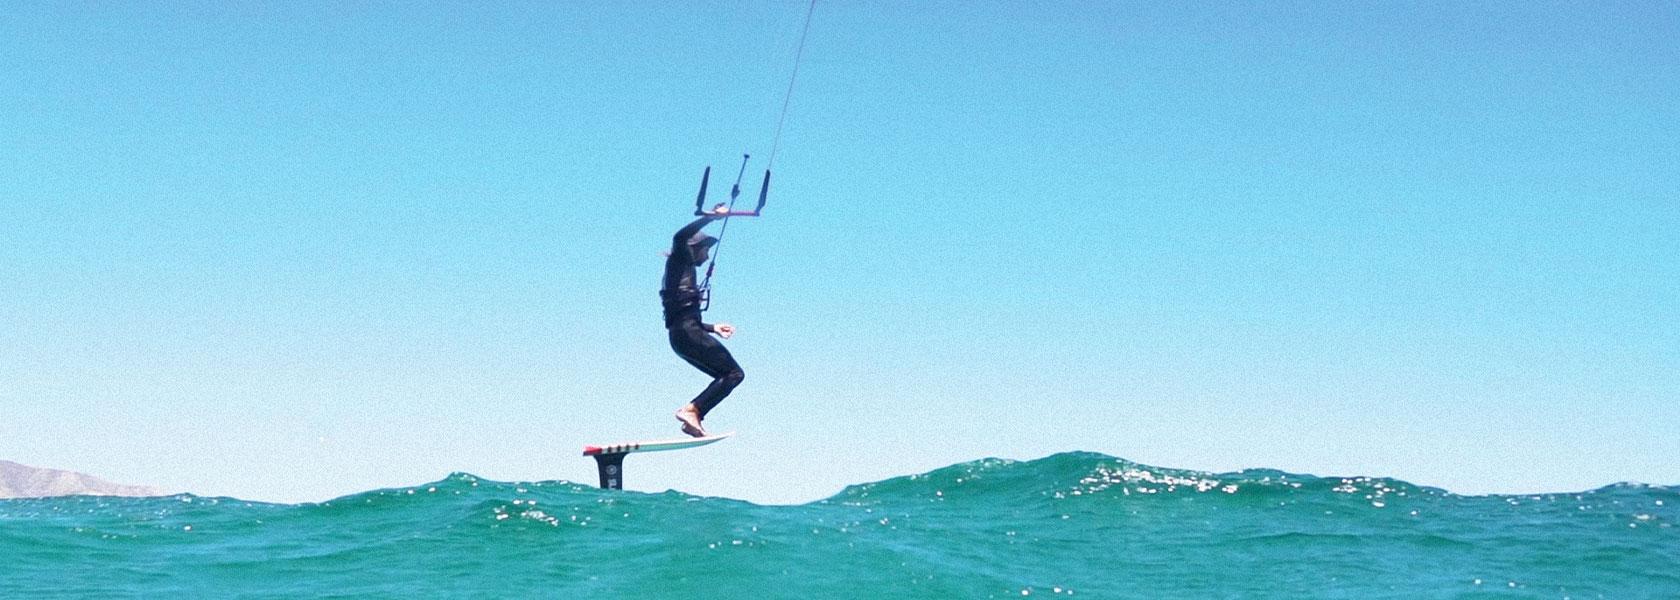 Slingshot team rider Robby Stewart on a kite foil board.